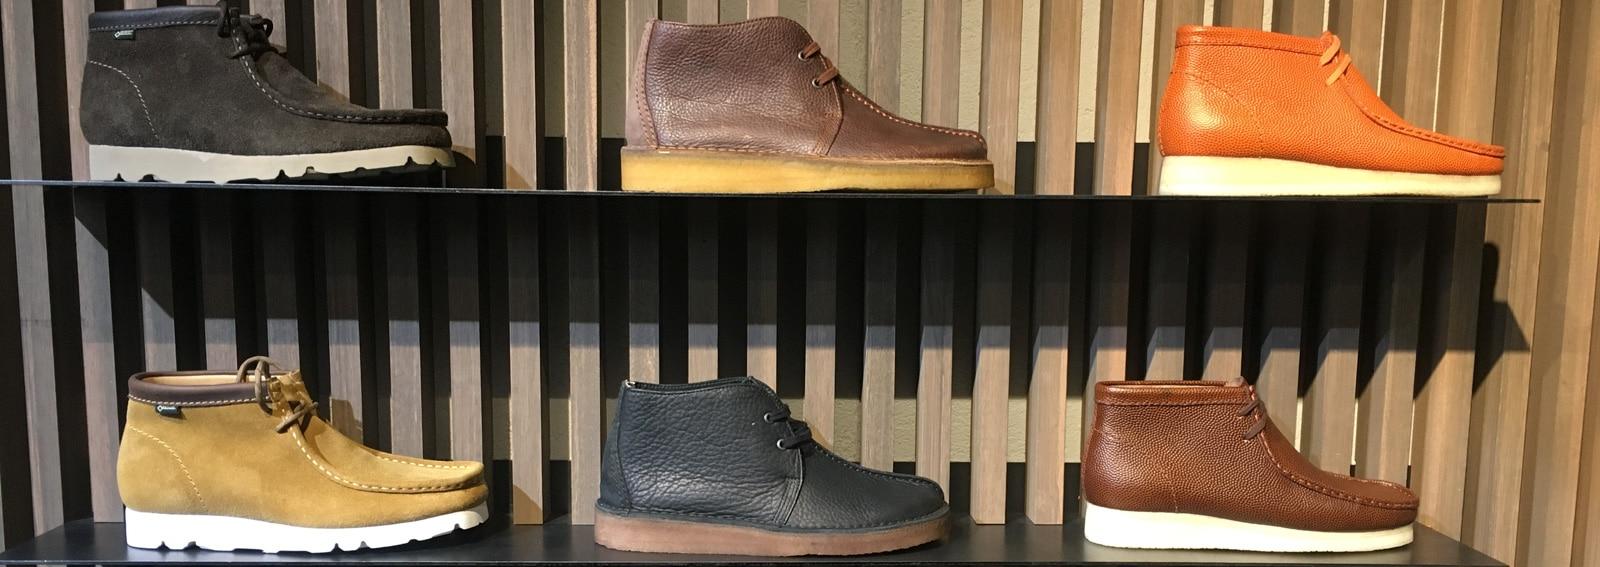 cover-scarpe-pitti-2017-desktop-